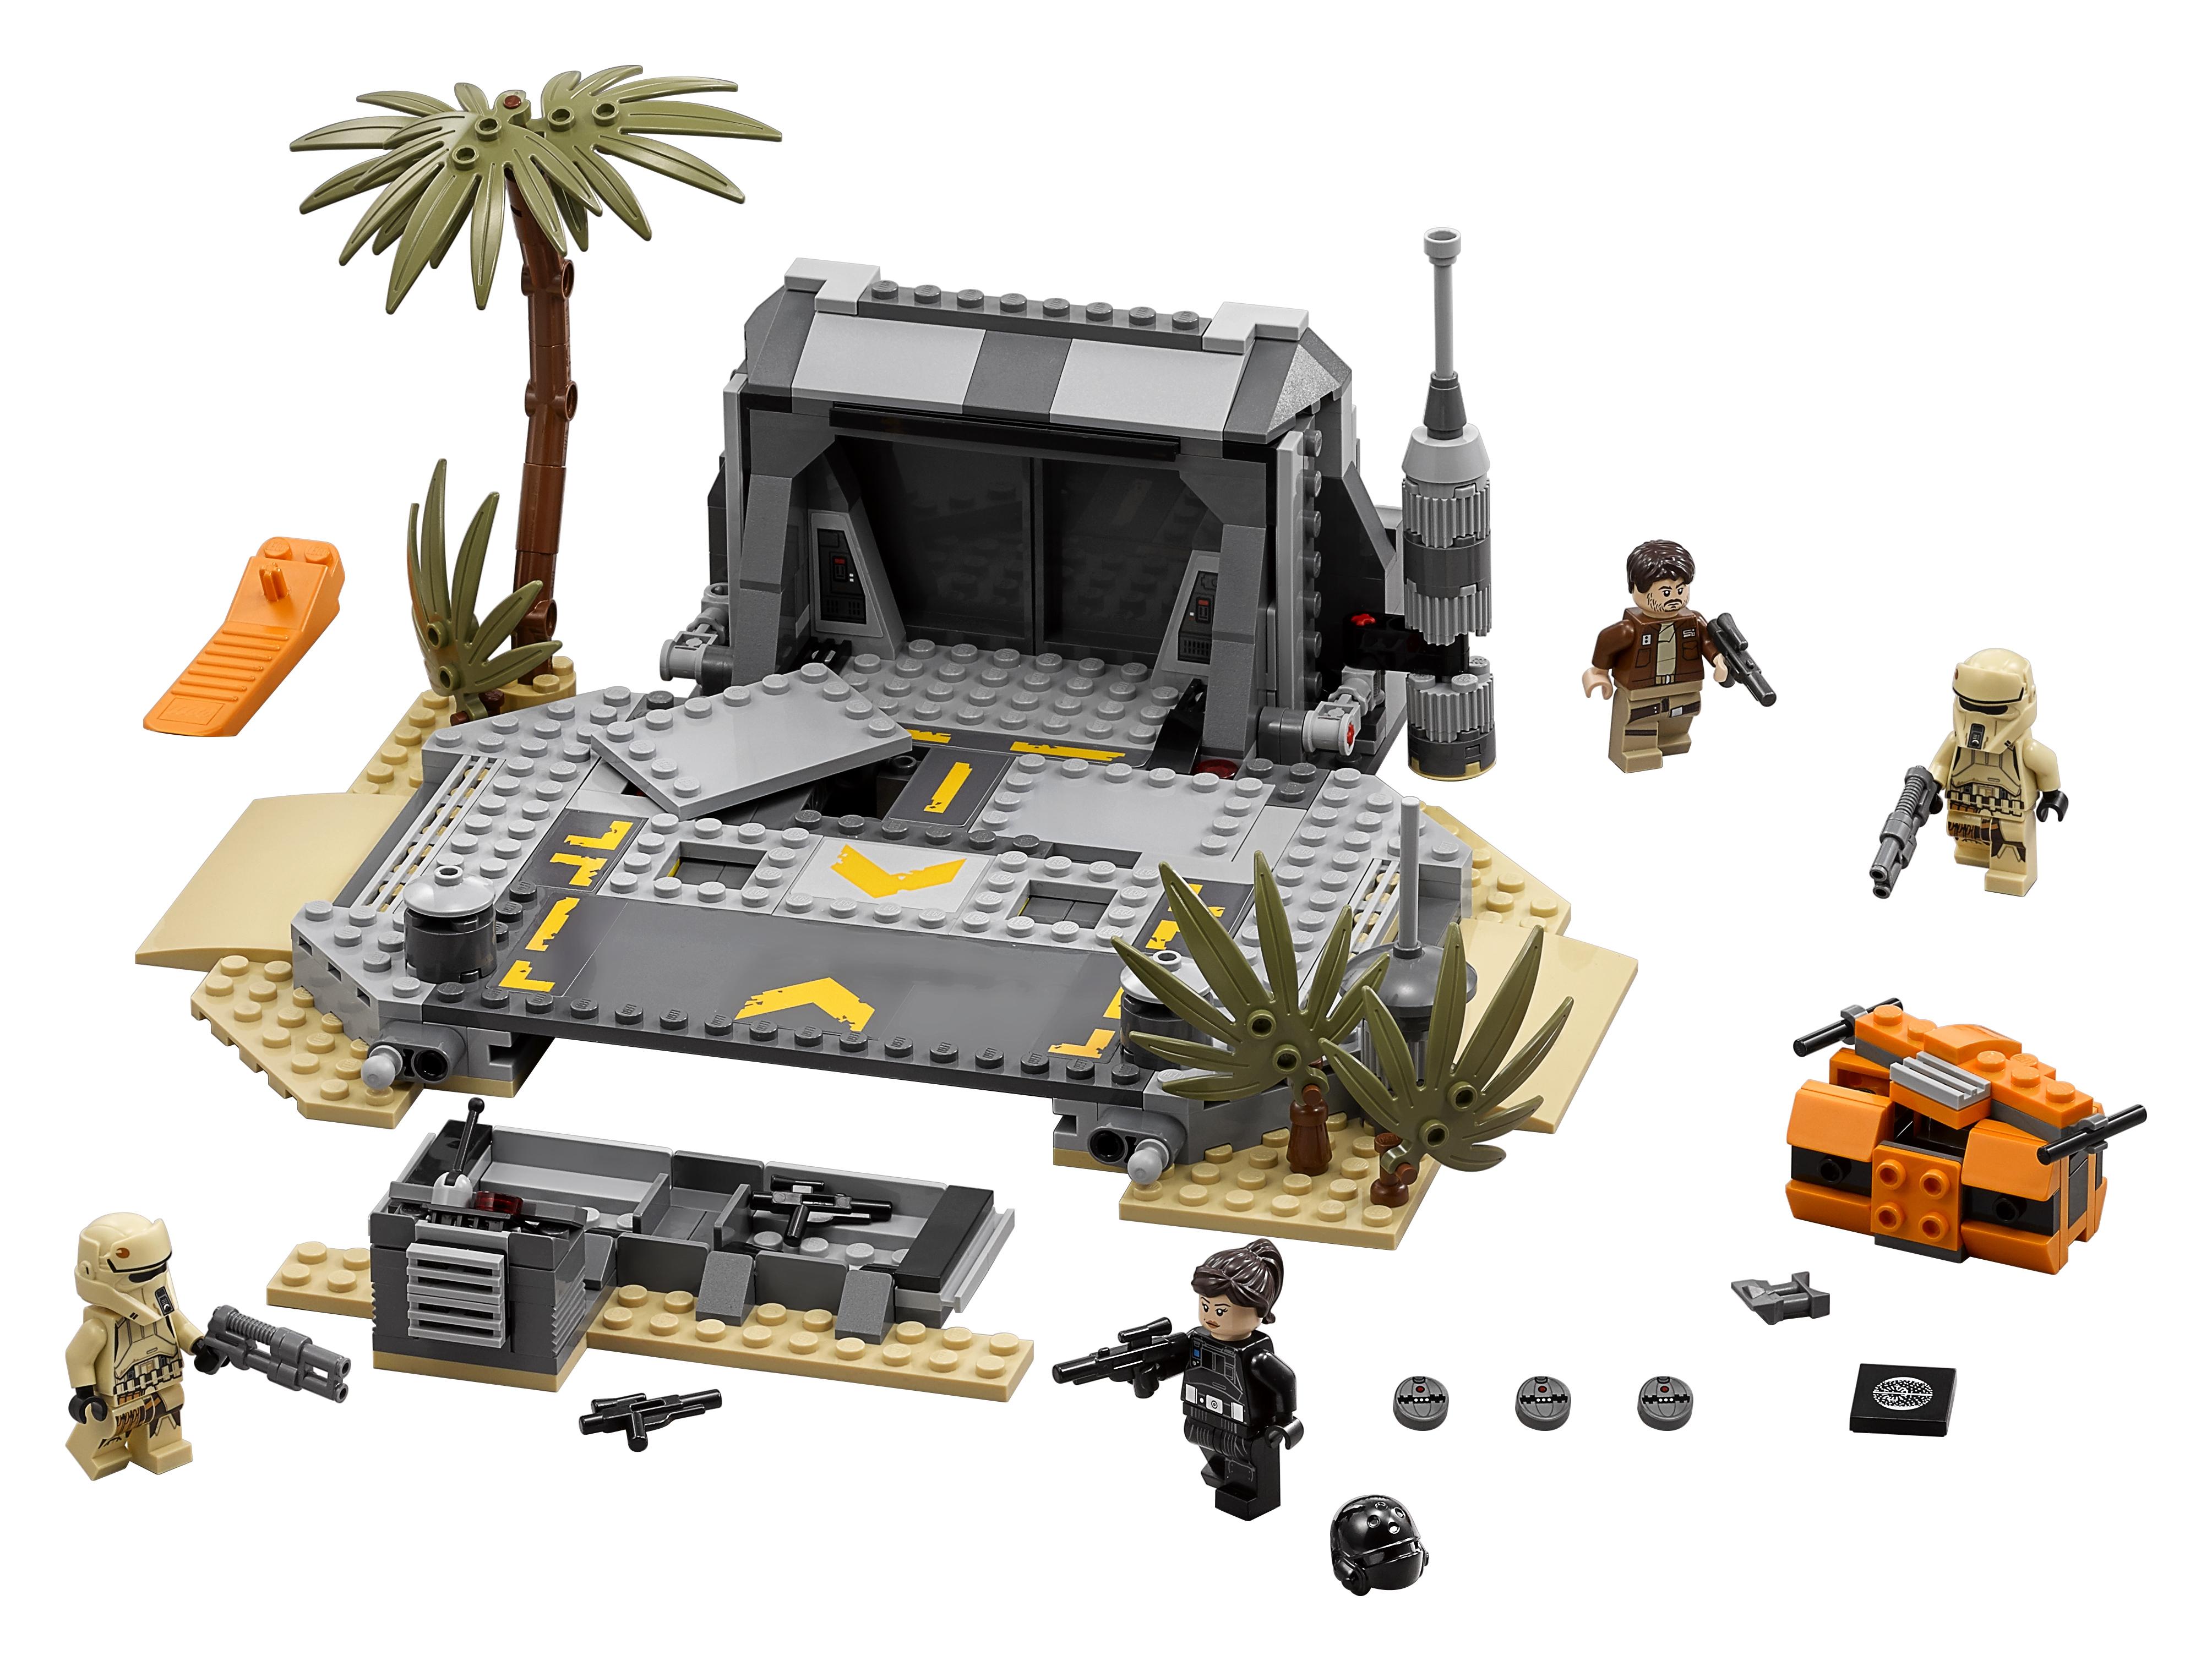 Star Wars LEGO Star Wars 75171 Битва на Скарифе lego star wars 75171 битва на скарифе